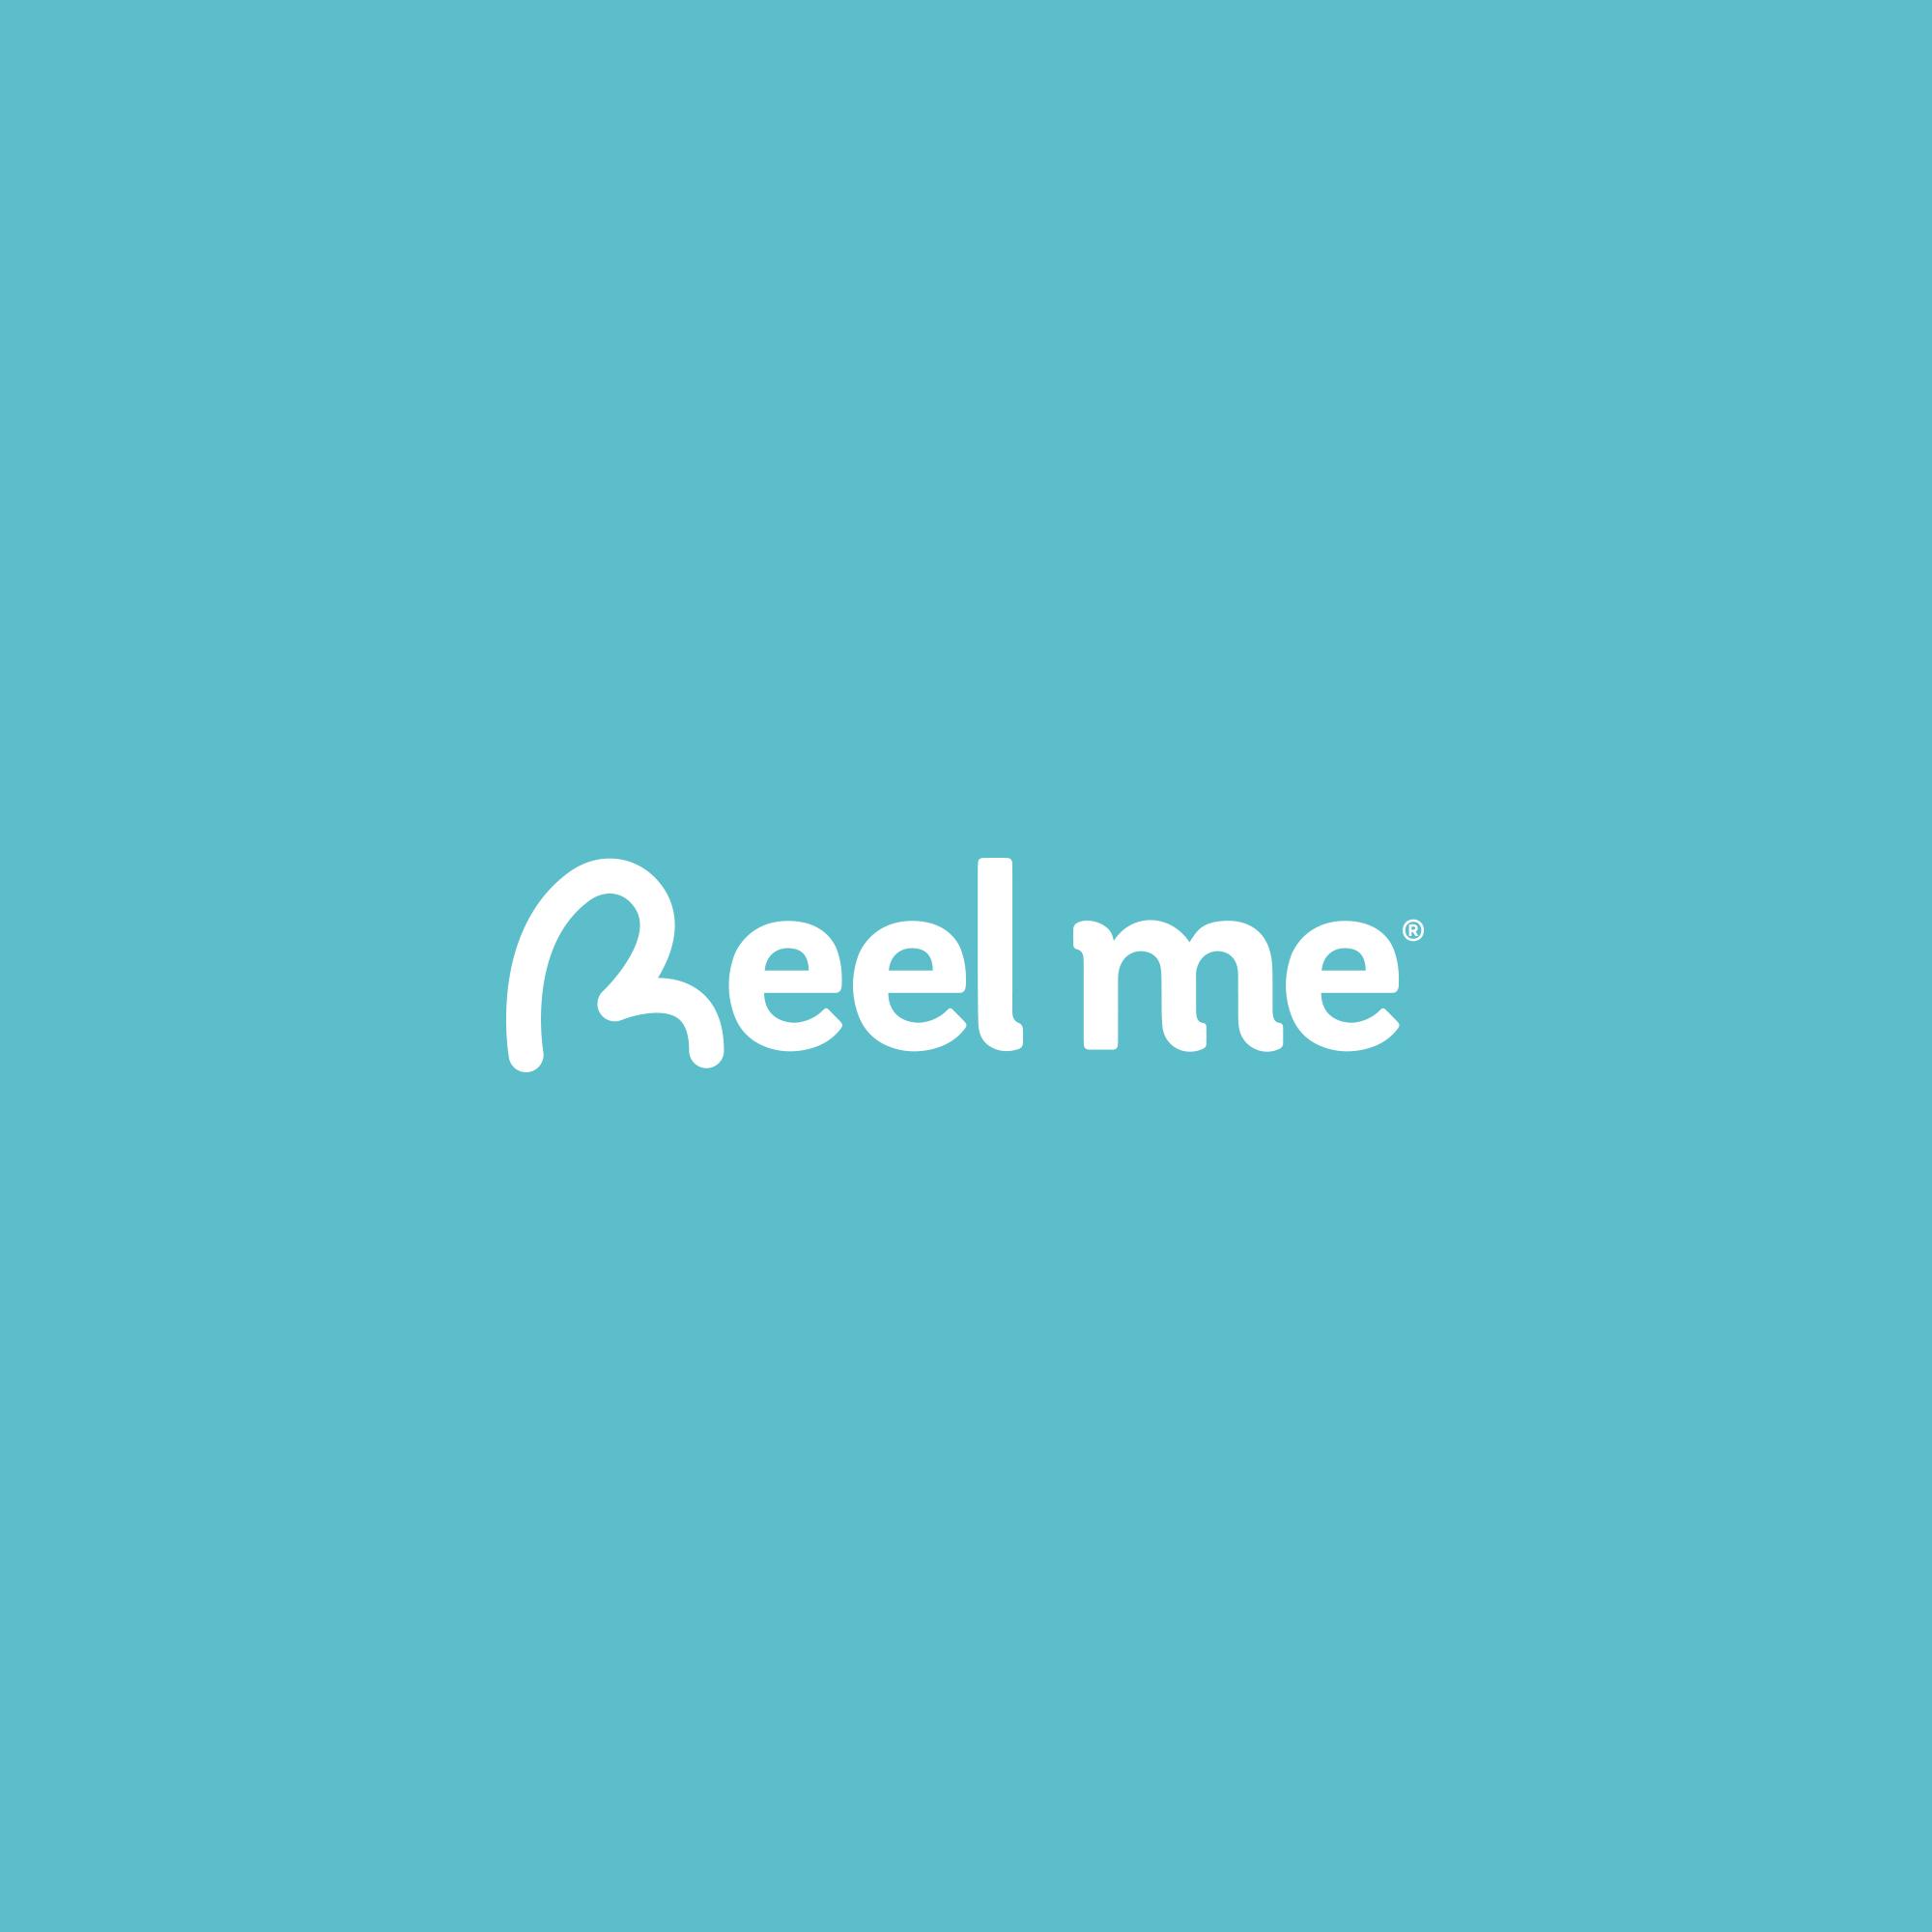 Evidemment l'Agence | logo Reel me OK fond bleu